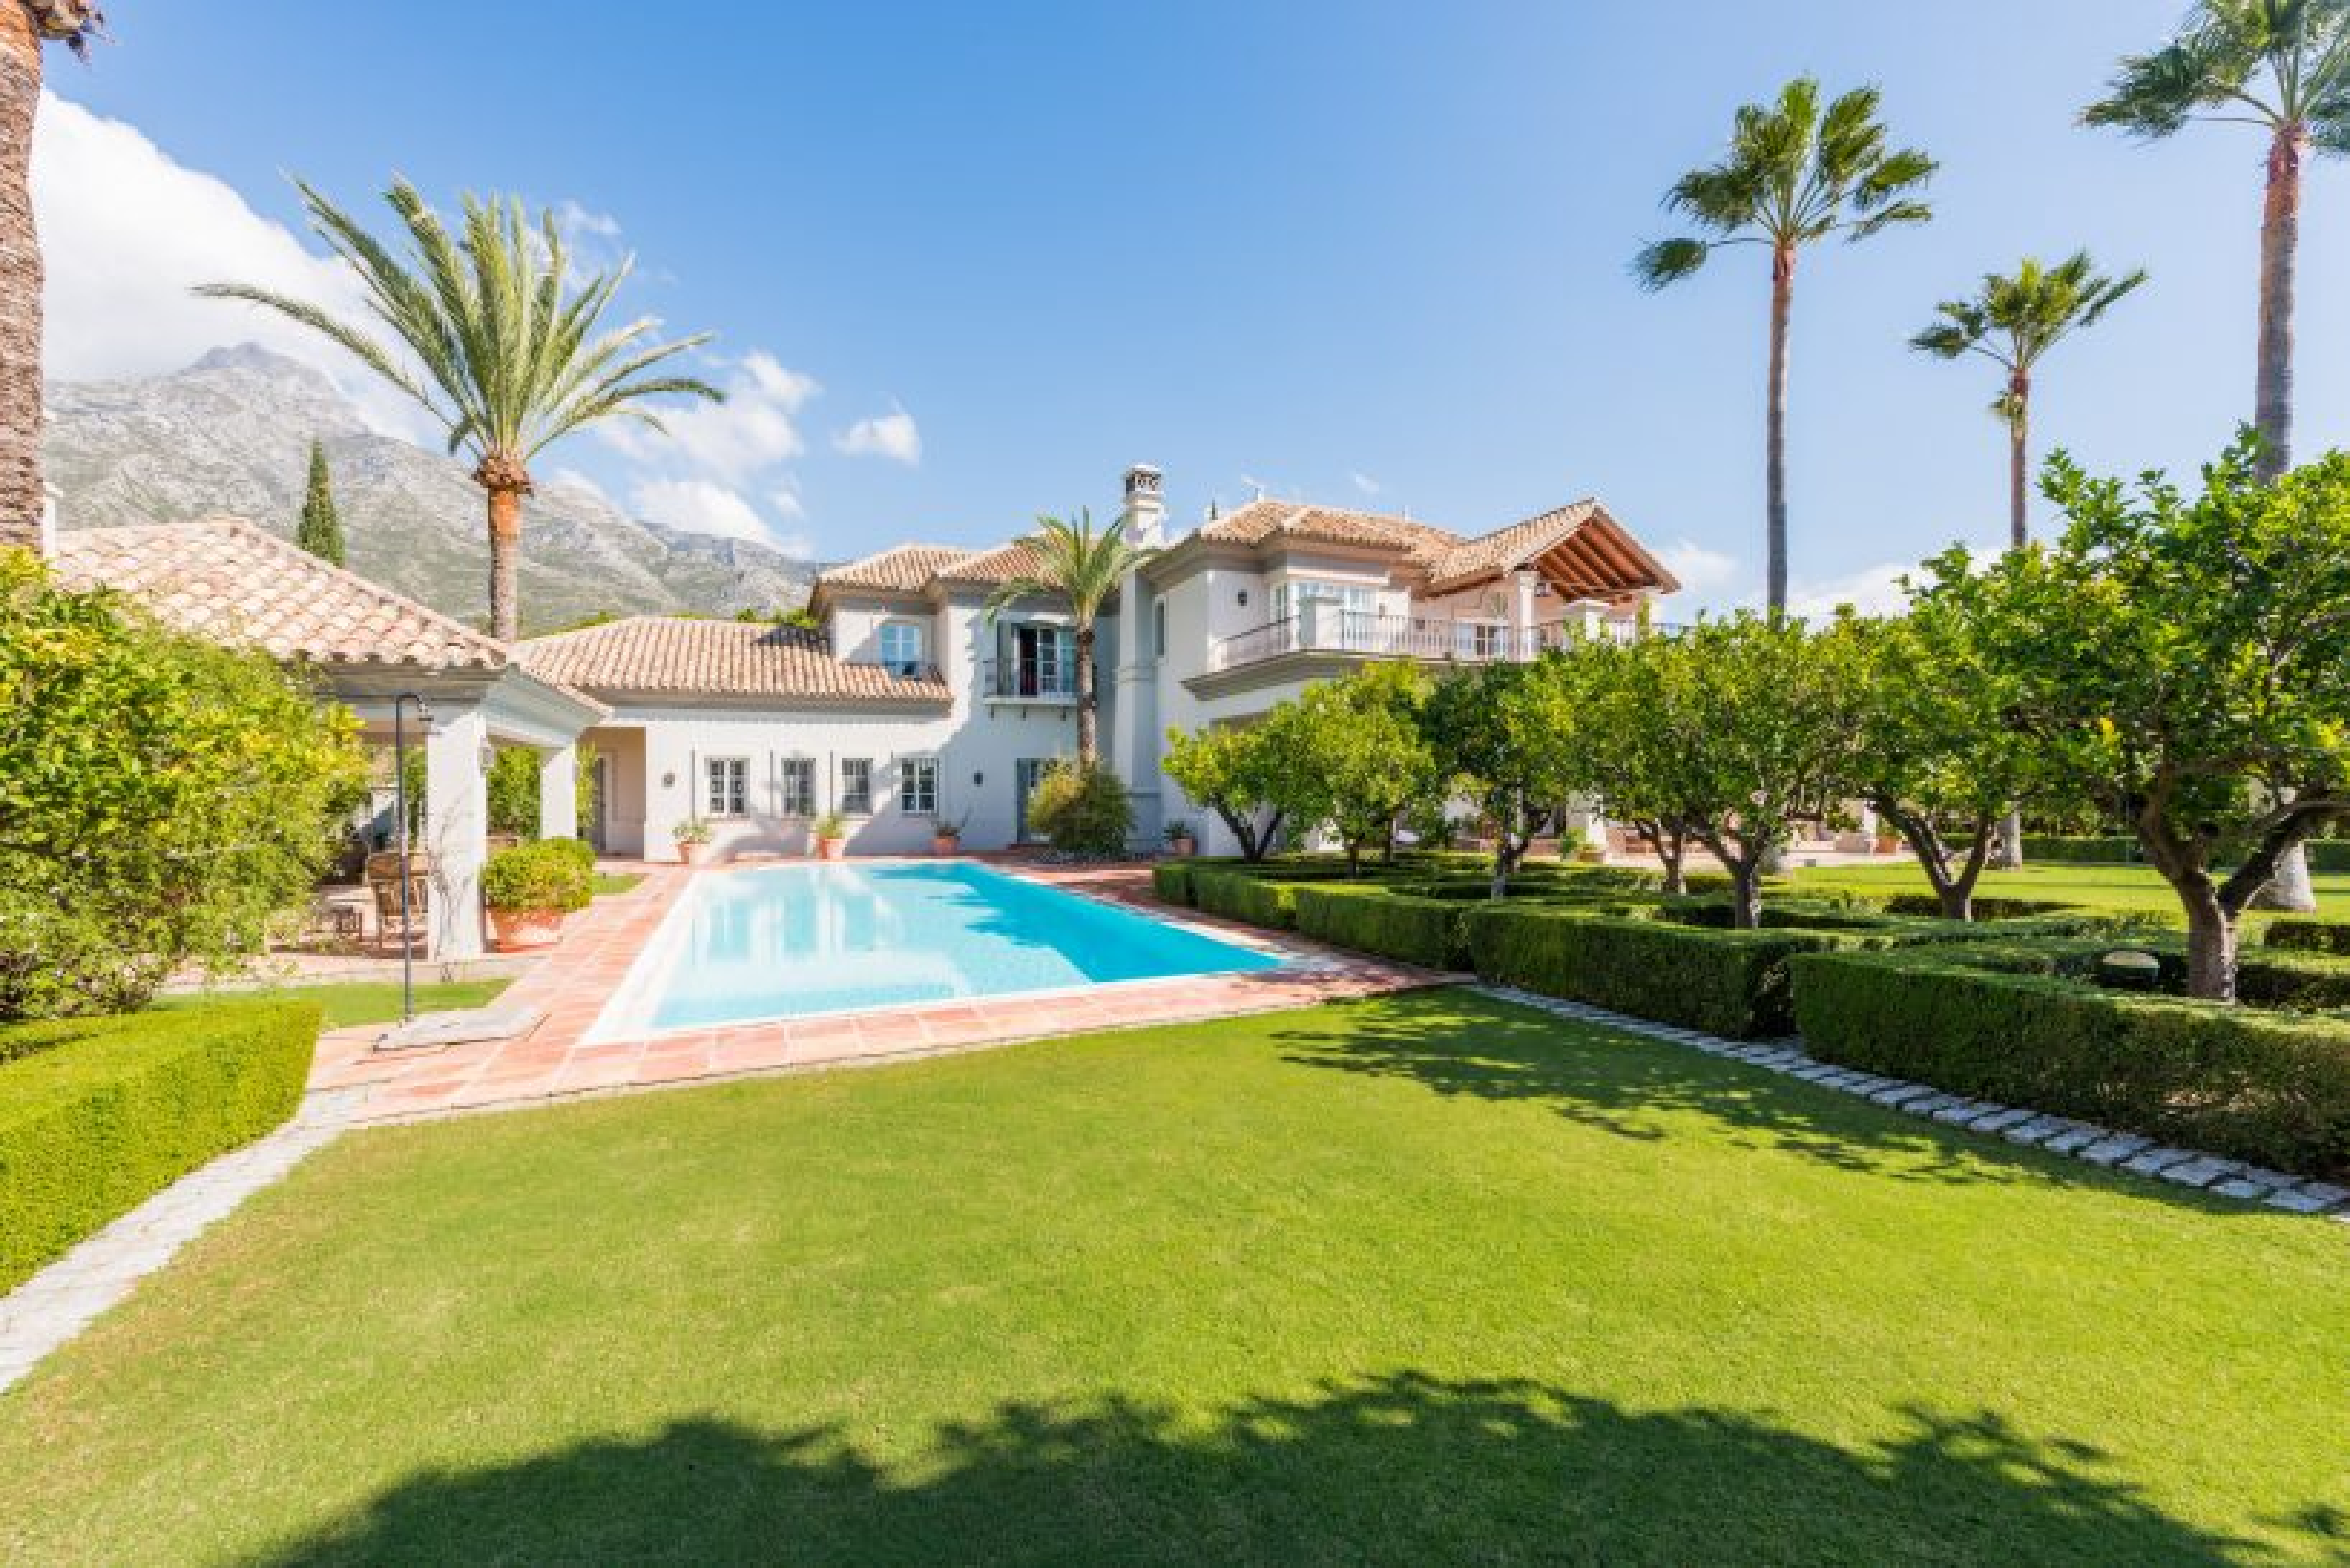 Location de propriétés haut de gamme à Marbella